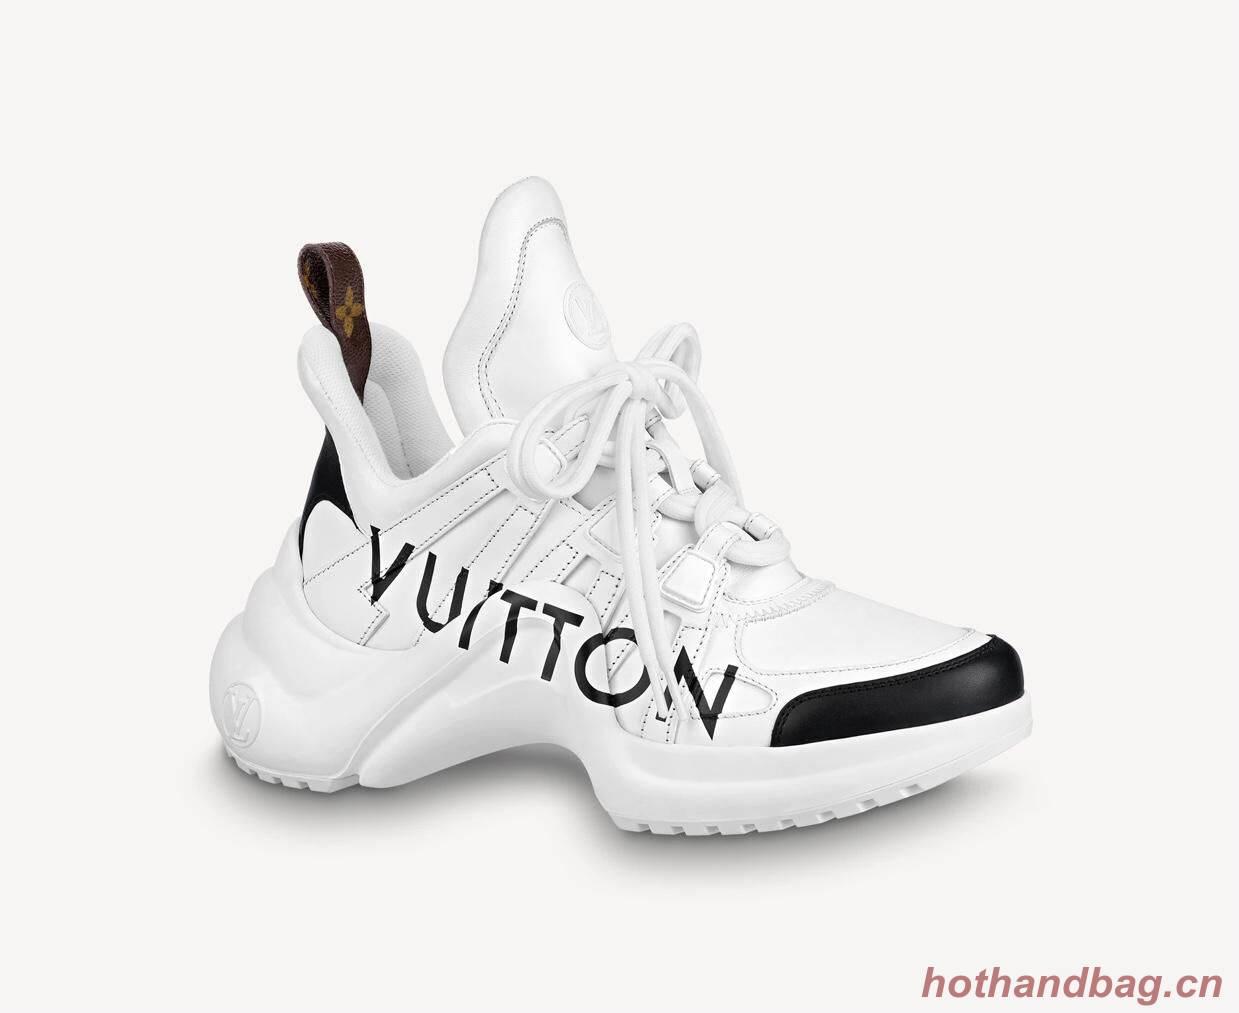 Louis Vuitton Shoes LV20365 White